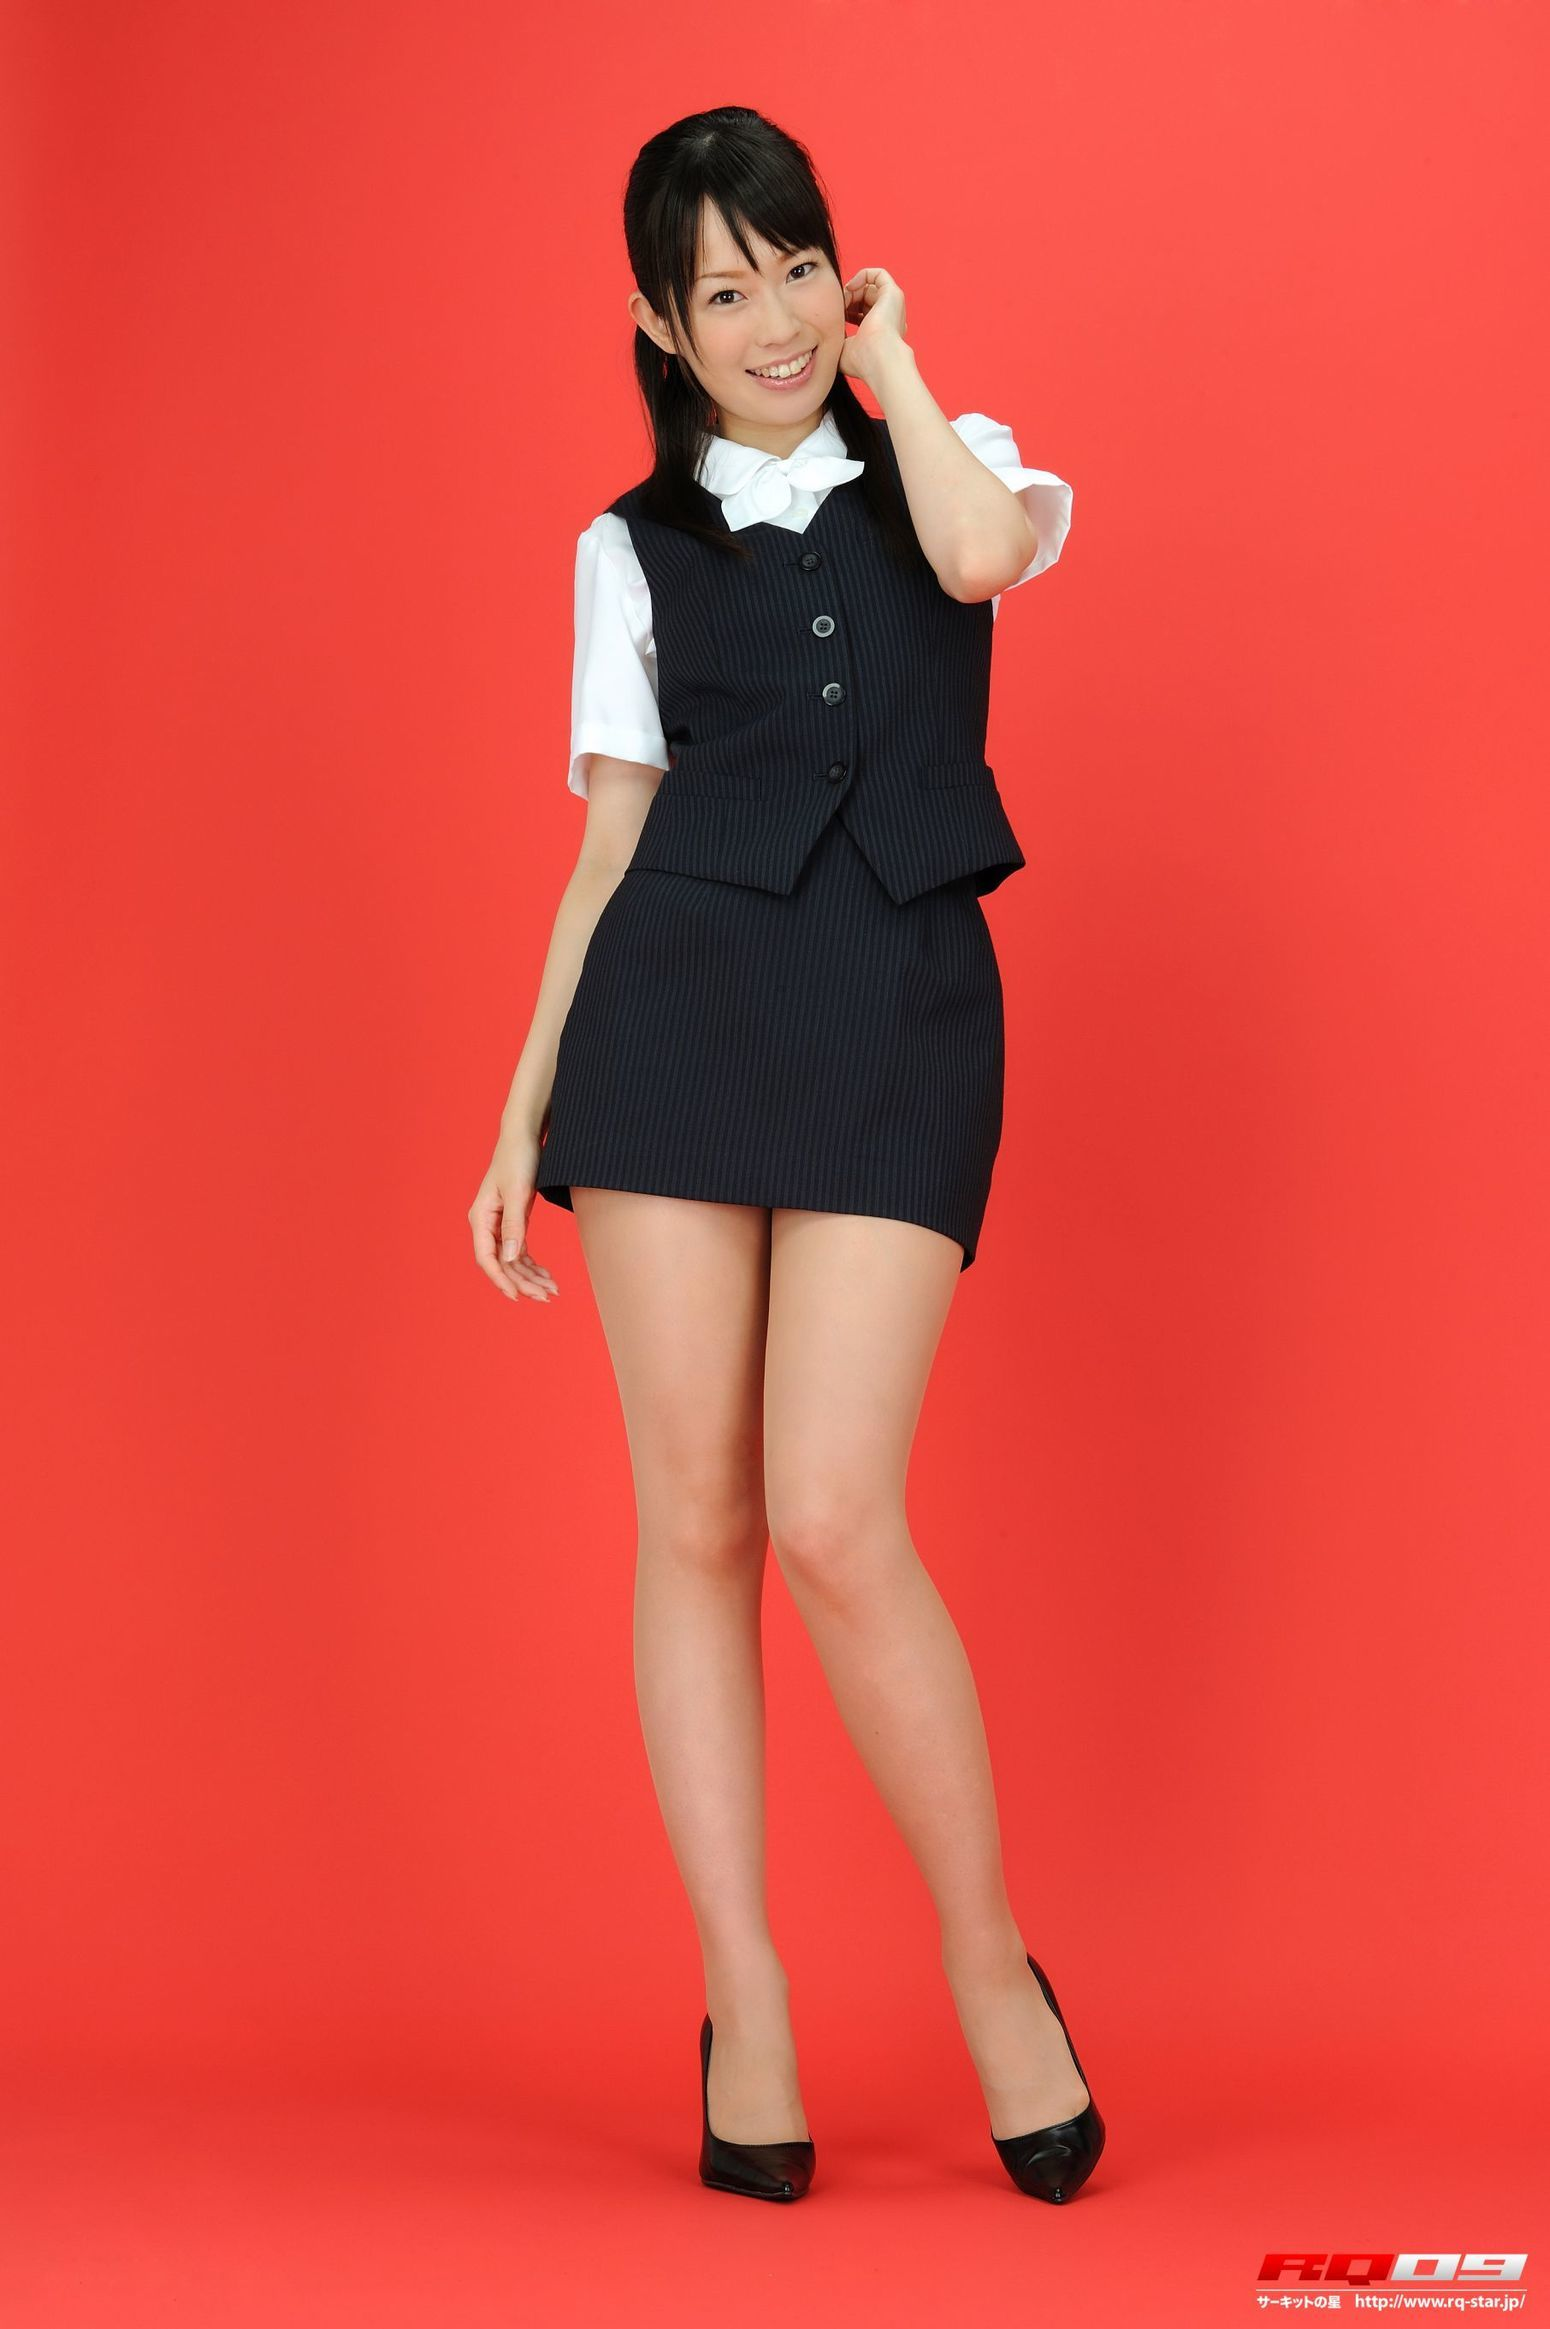 [RQ-STAR] NO.00193 Miyuki Koizumi 小泉みゆき Office Lady 写真集(50) -美女